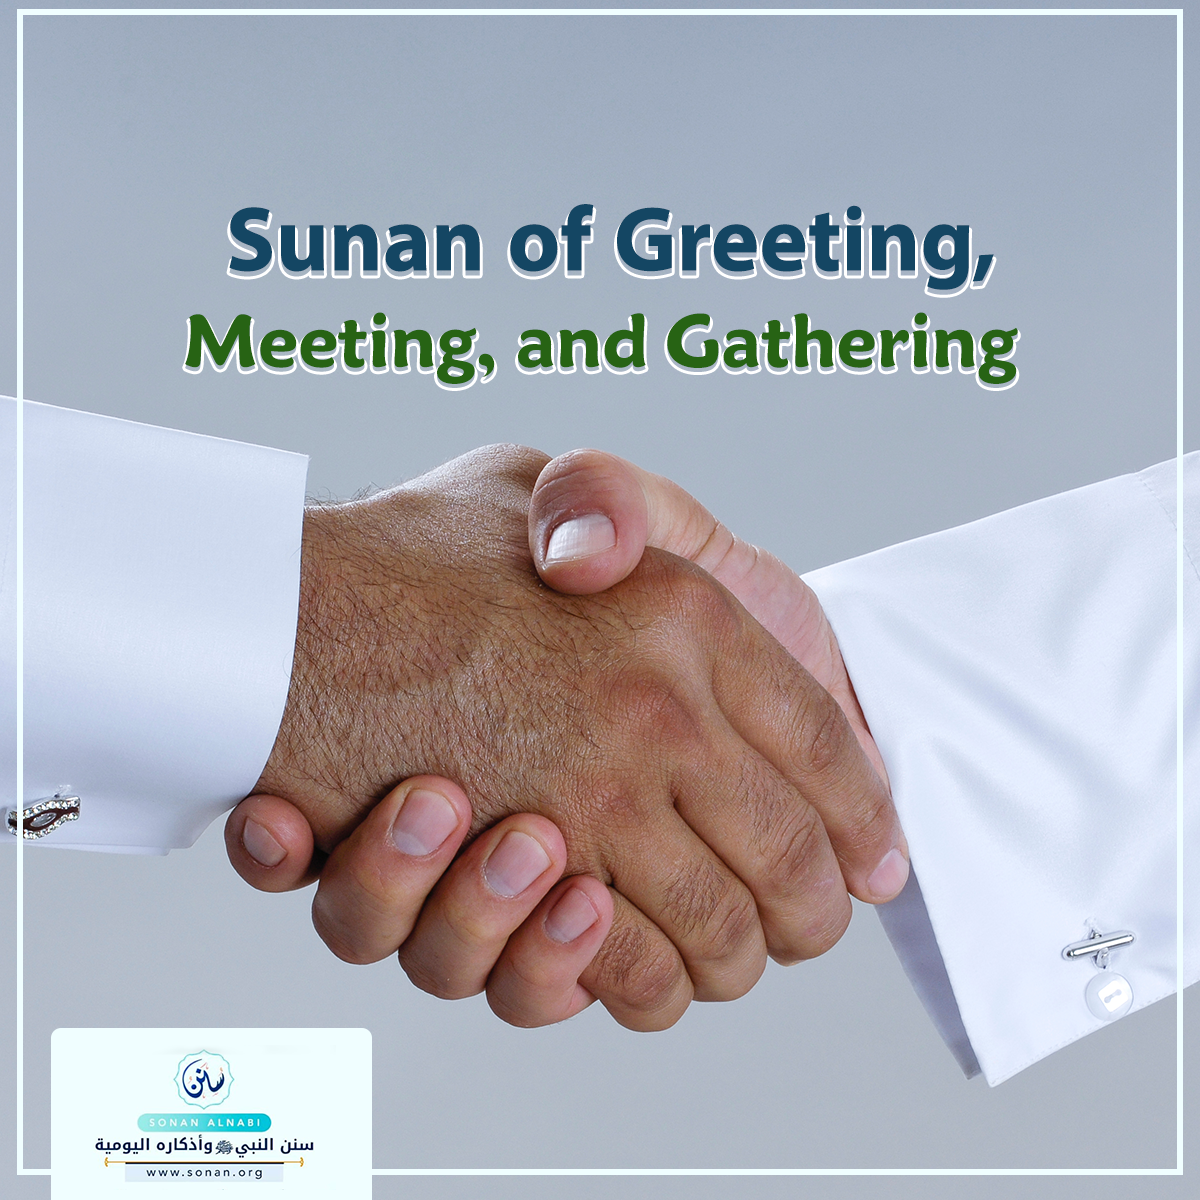 Sunan of Greeting, Meeting, and Gathering